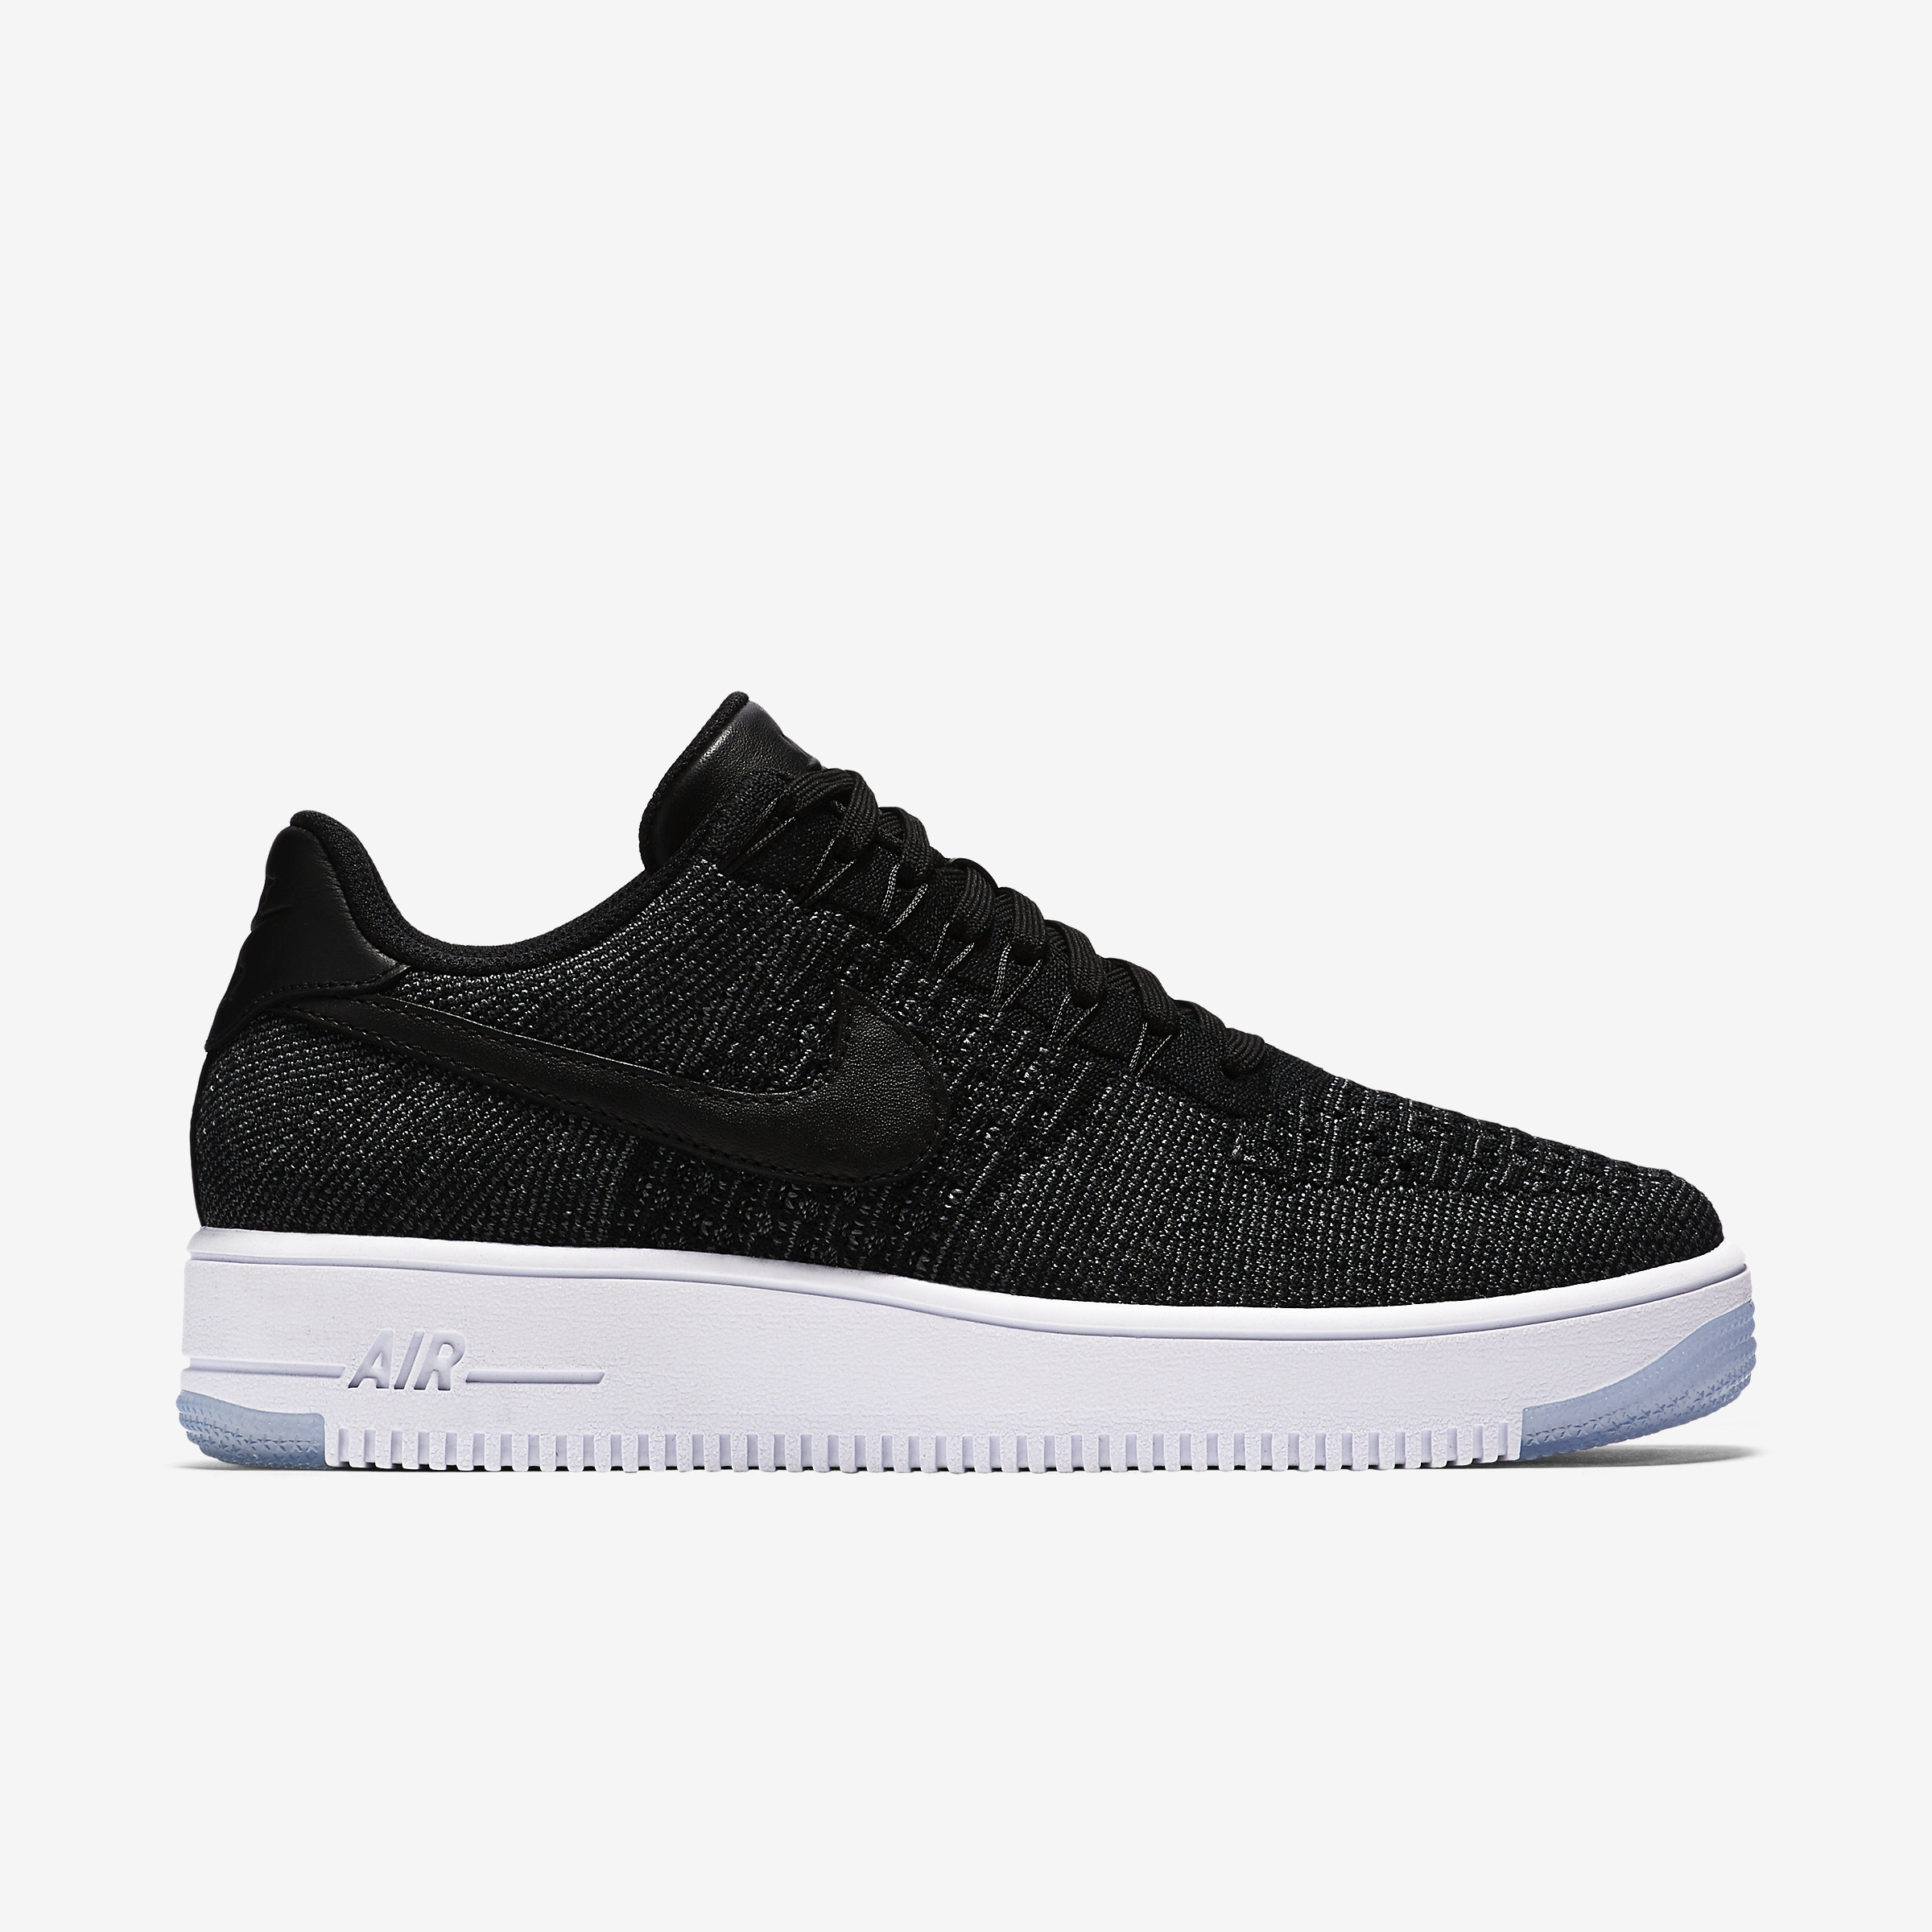 Nike Leather Air Force 1 Flyknit Low in Black,Dark Grey,White,Black (Black) for Men